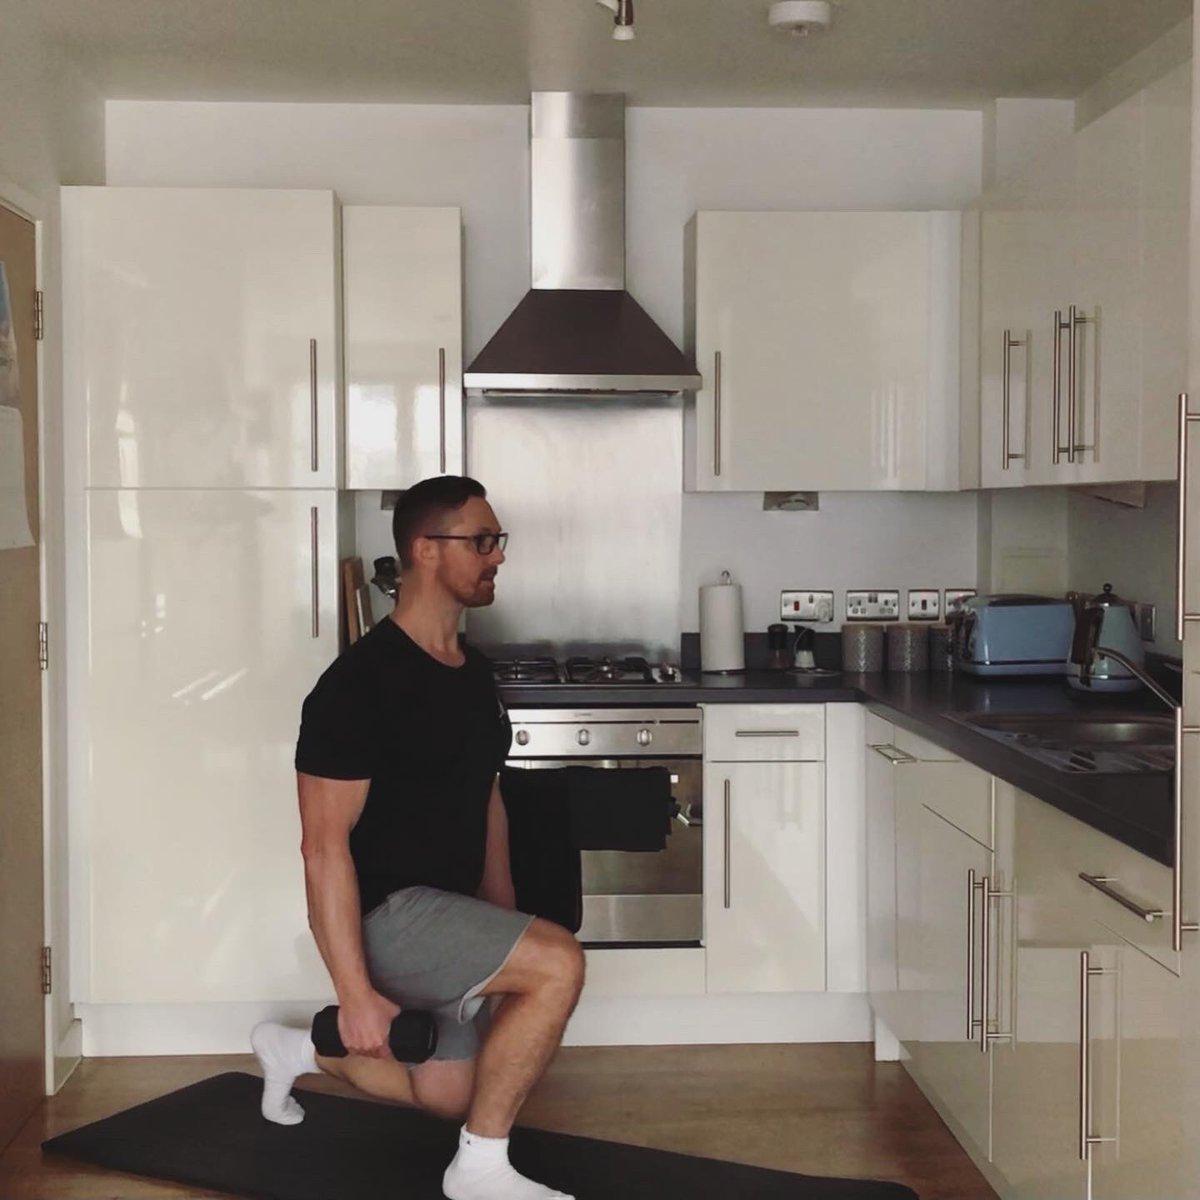 DUMBBELL FULL BODY WORKOUT.   ⬇️⬇️⬇️⬇️⬇️    #homeworkout #gym #dumbellworkout #workout #fitness #fun #bodybuilding #squats #chestworkout #legday #personaltrainer #londonpersonaltrainer #onlinecoach #housemusic #airjordan #nike